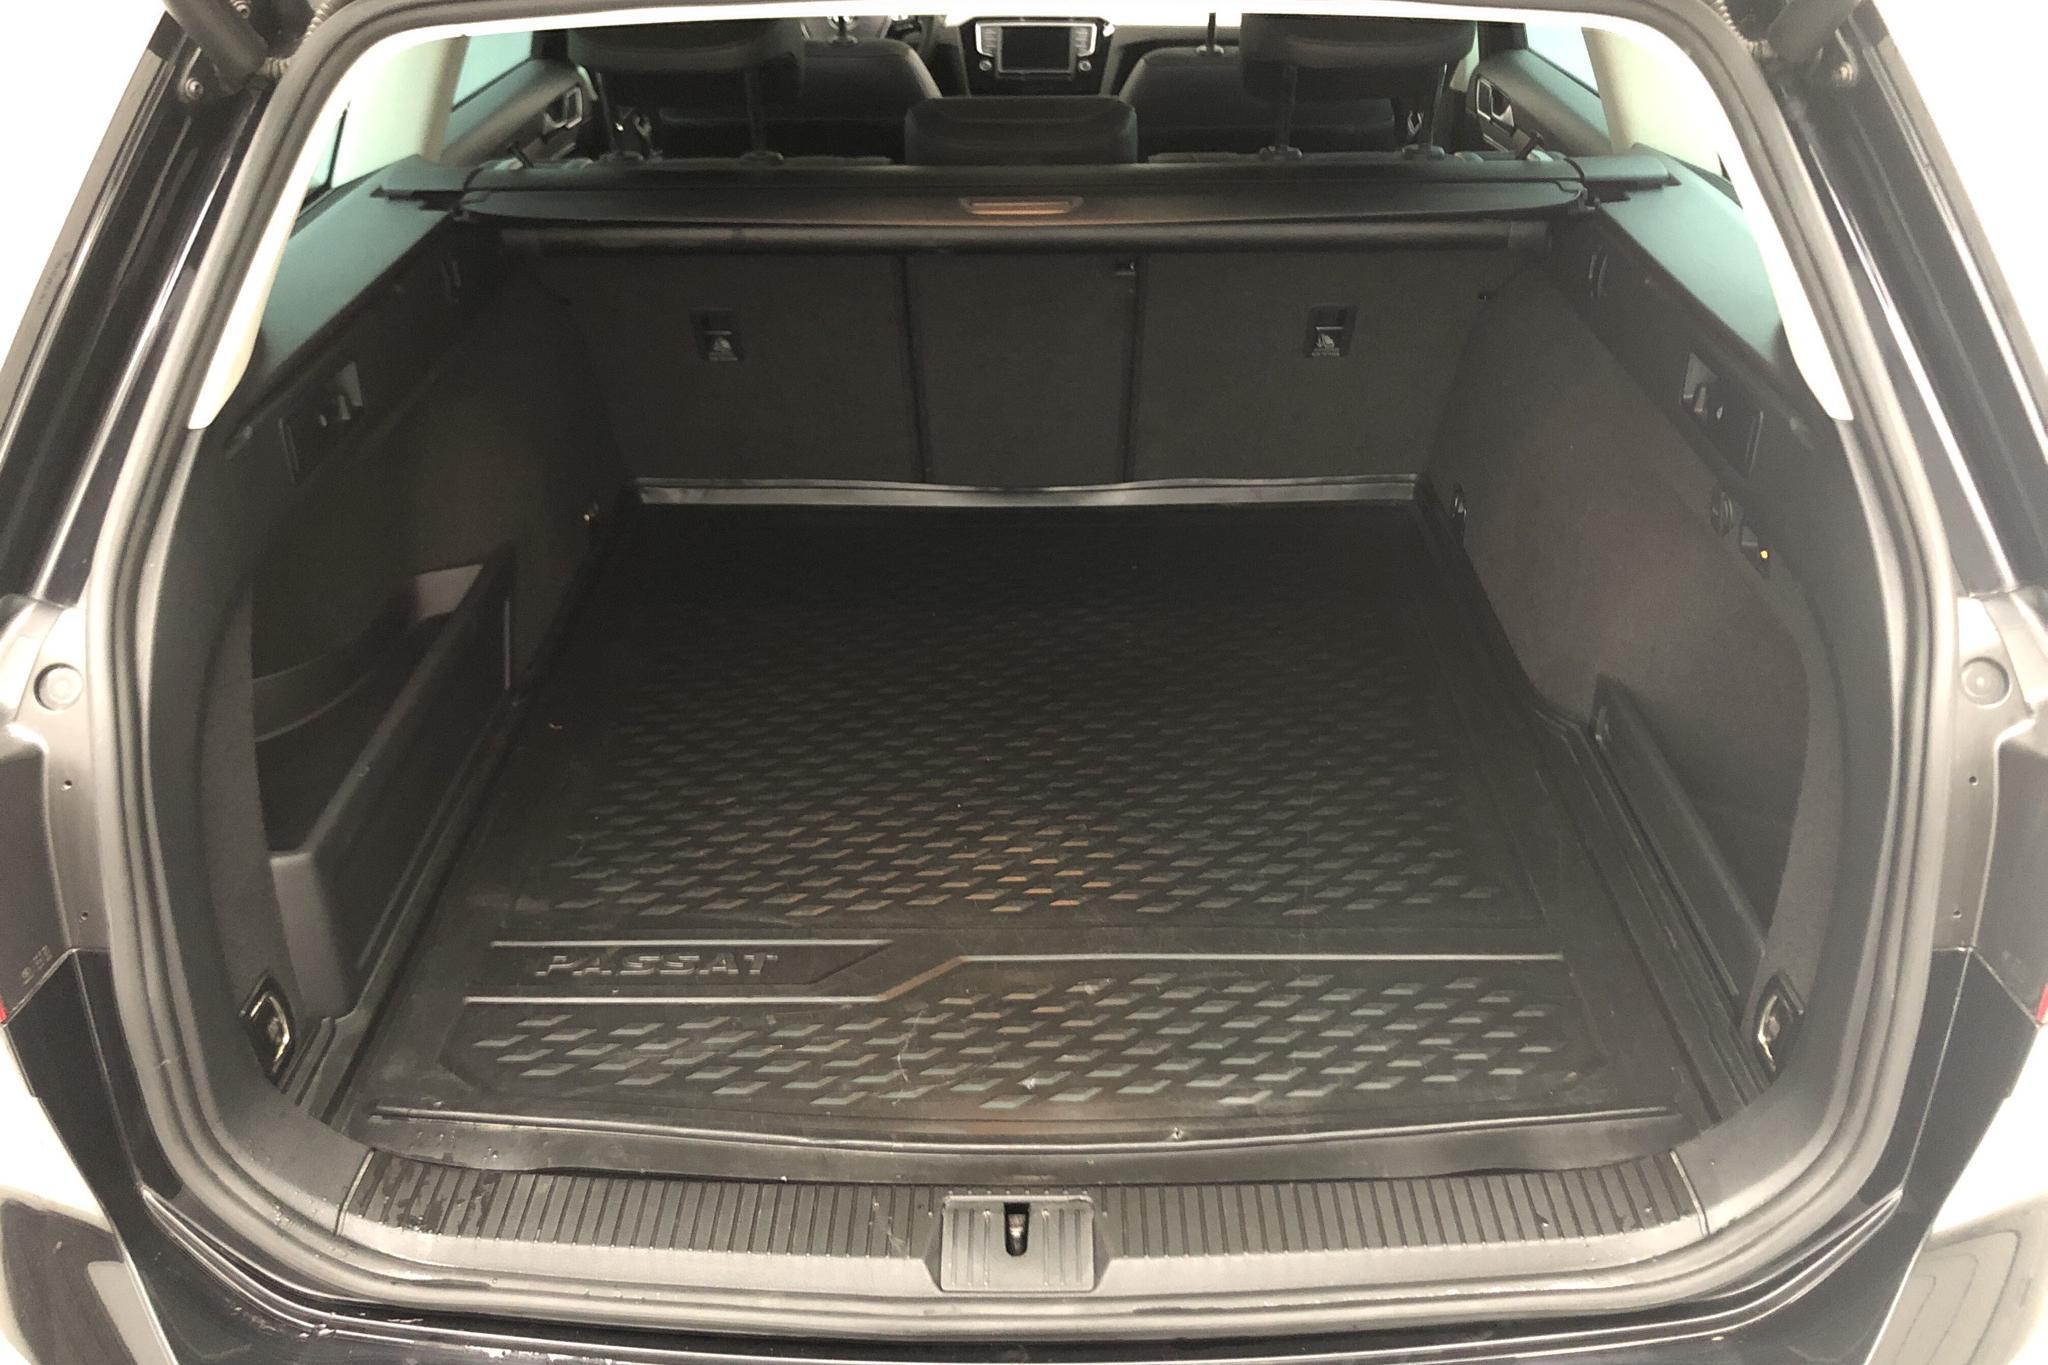 VW Passat Alltrack 2.0 TDI Sportscombi 4MOTION (190hk) - 67 080 km - Automatic - black - 2017